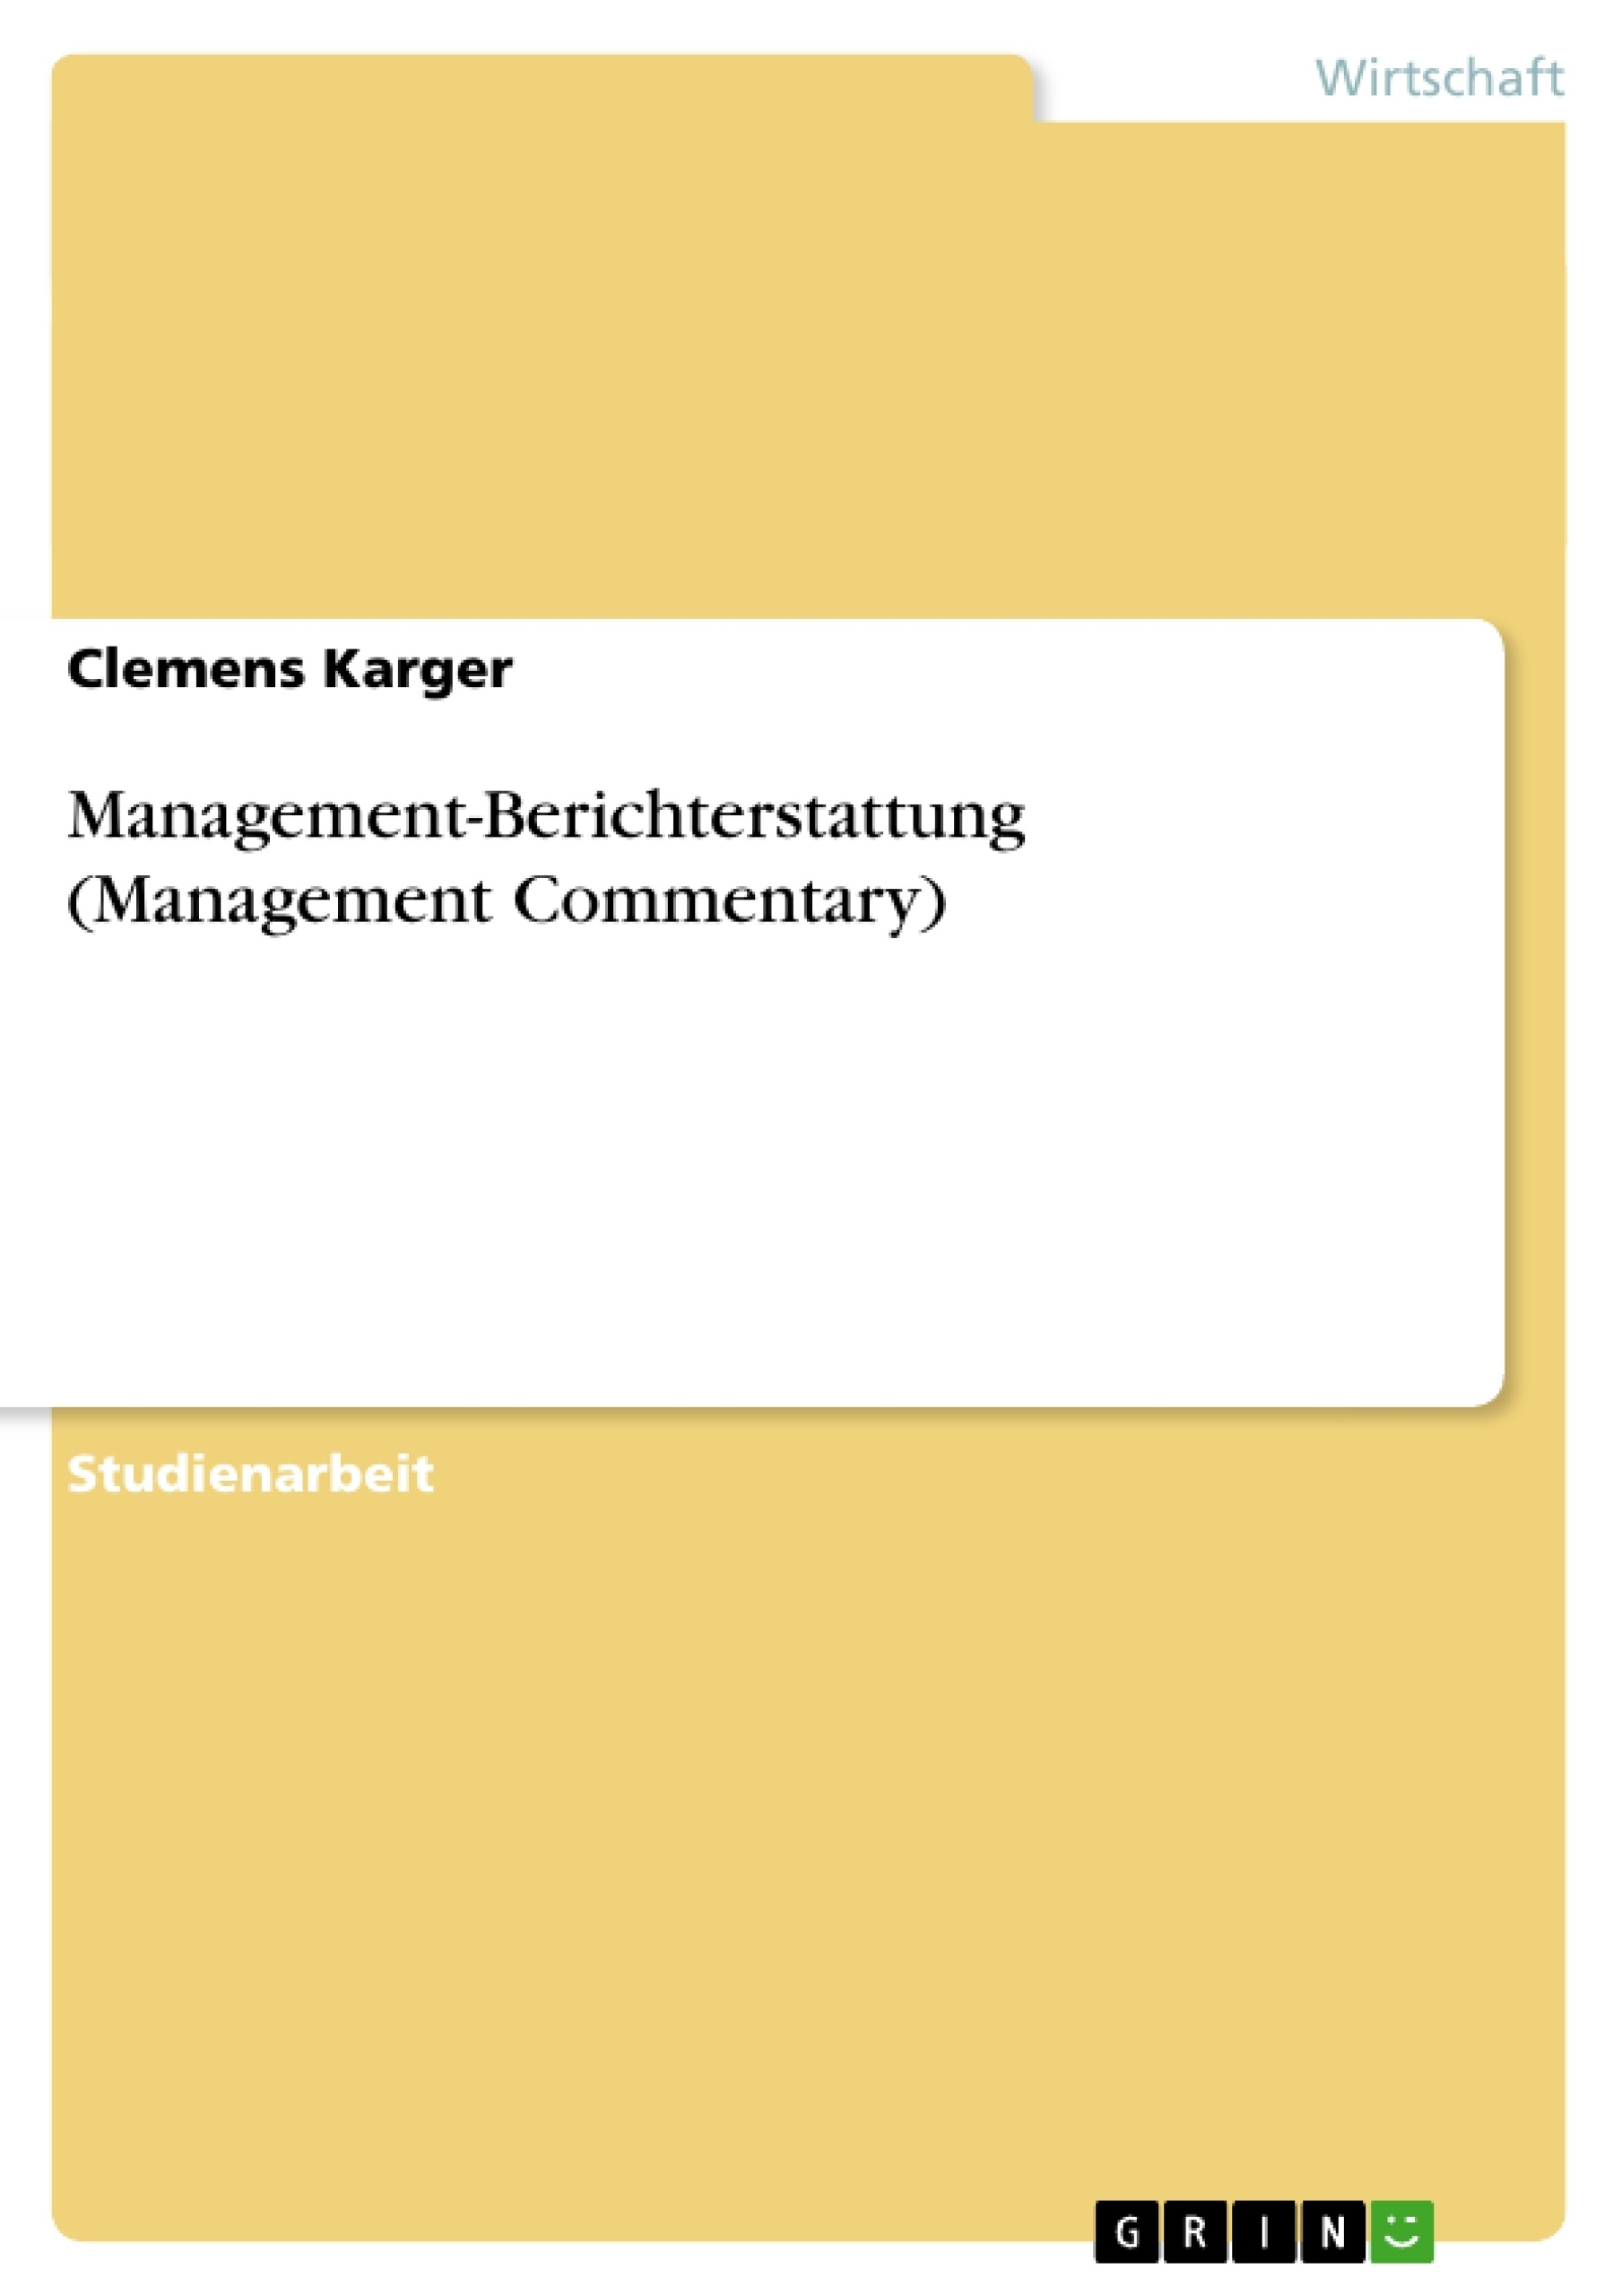 Titel: Management-Berichterstattung (Management Commentary)